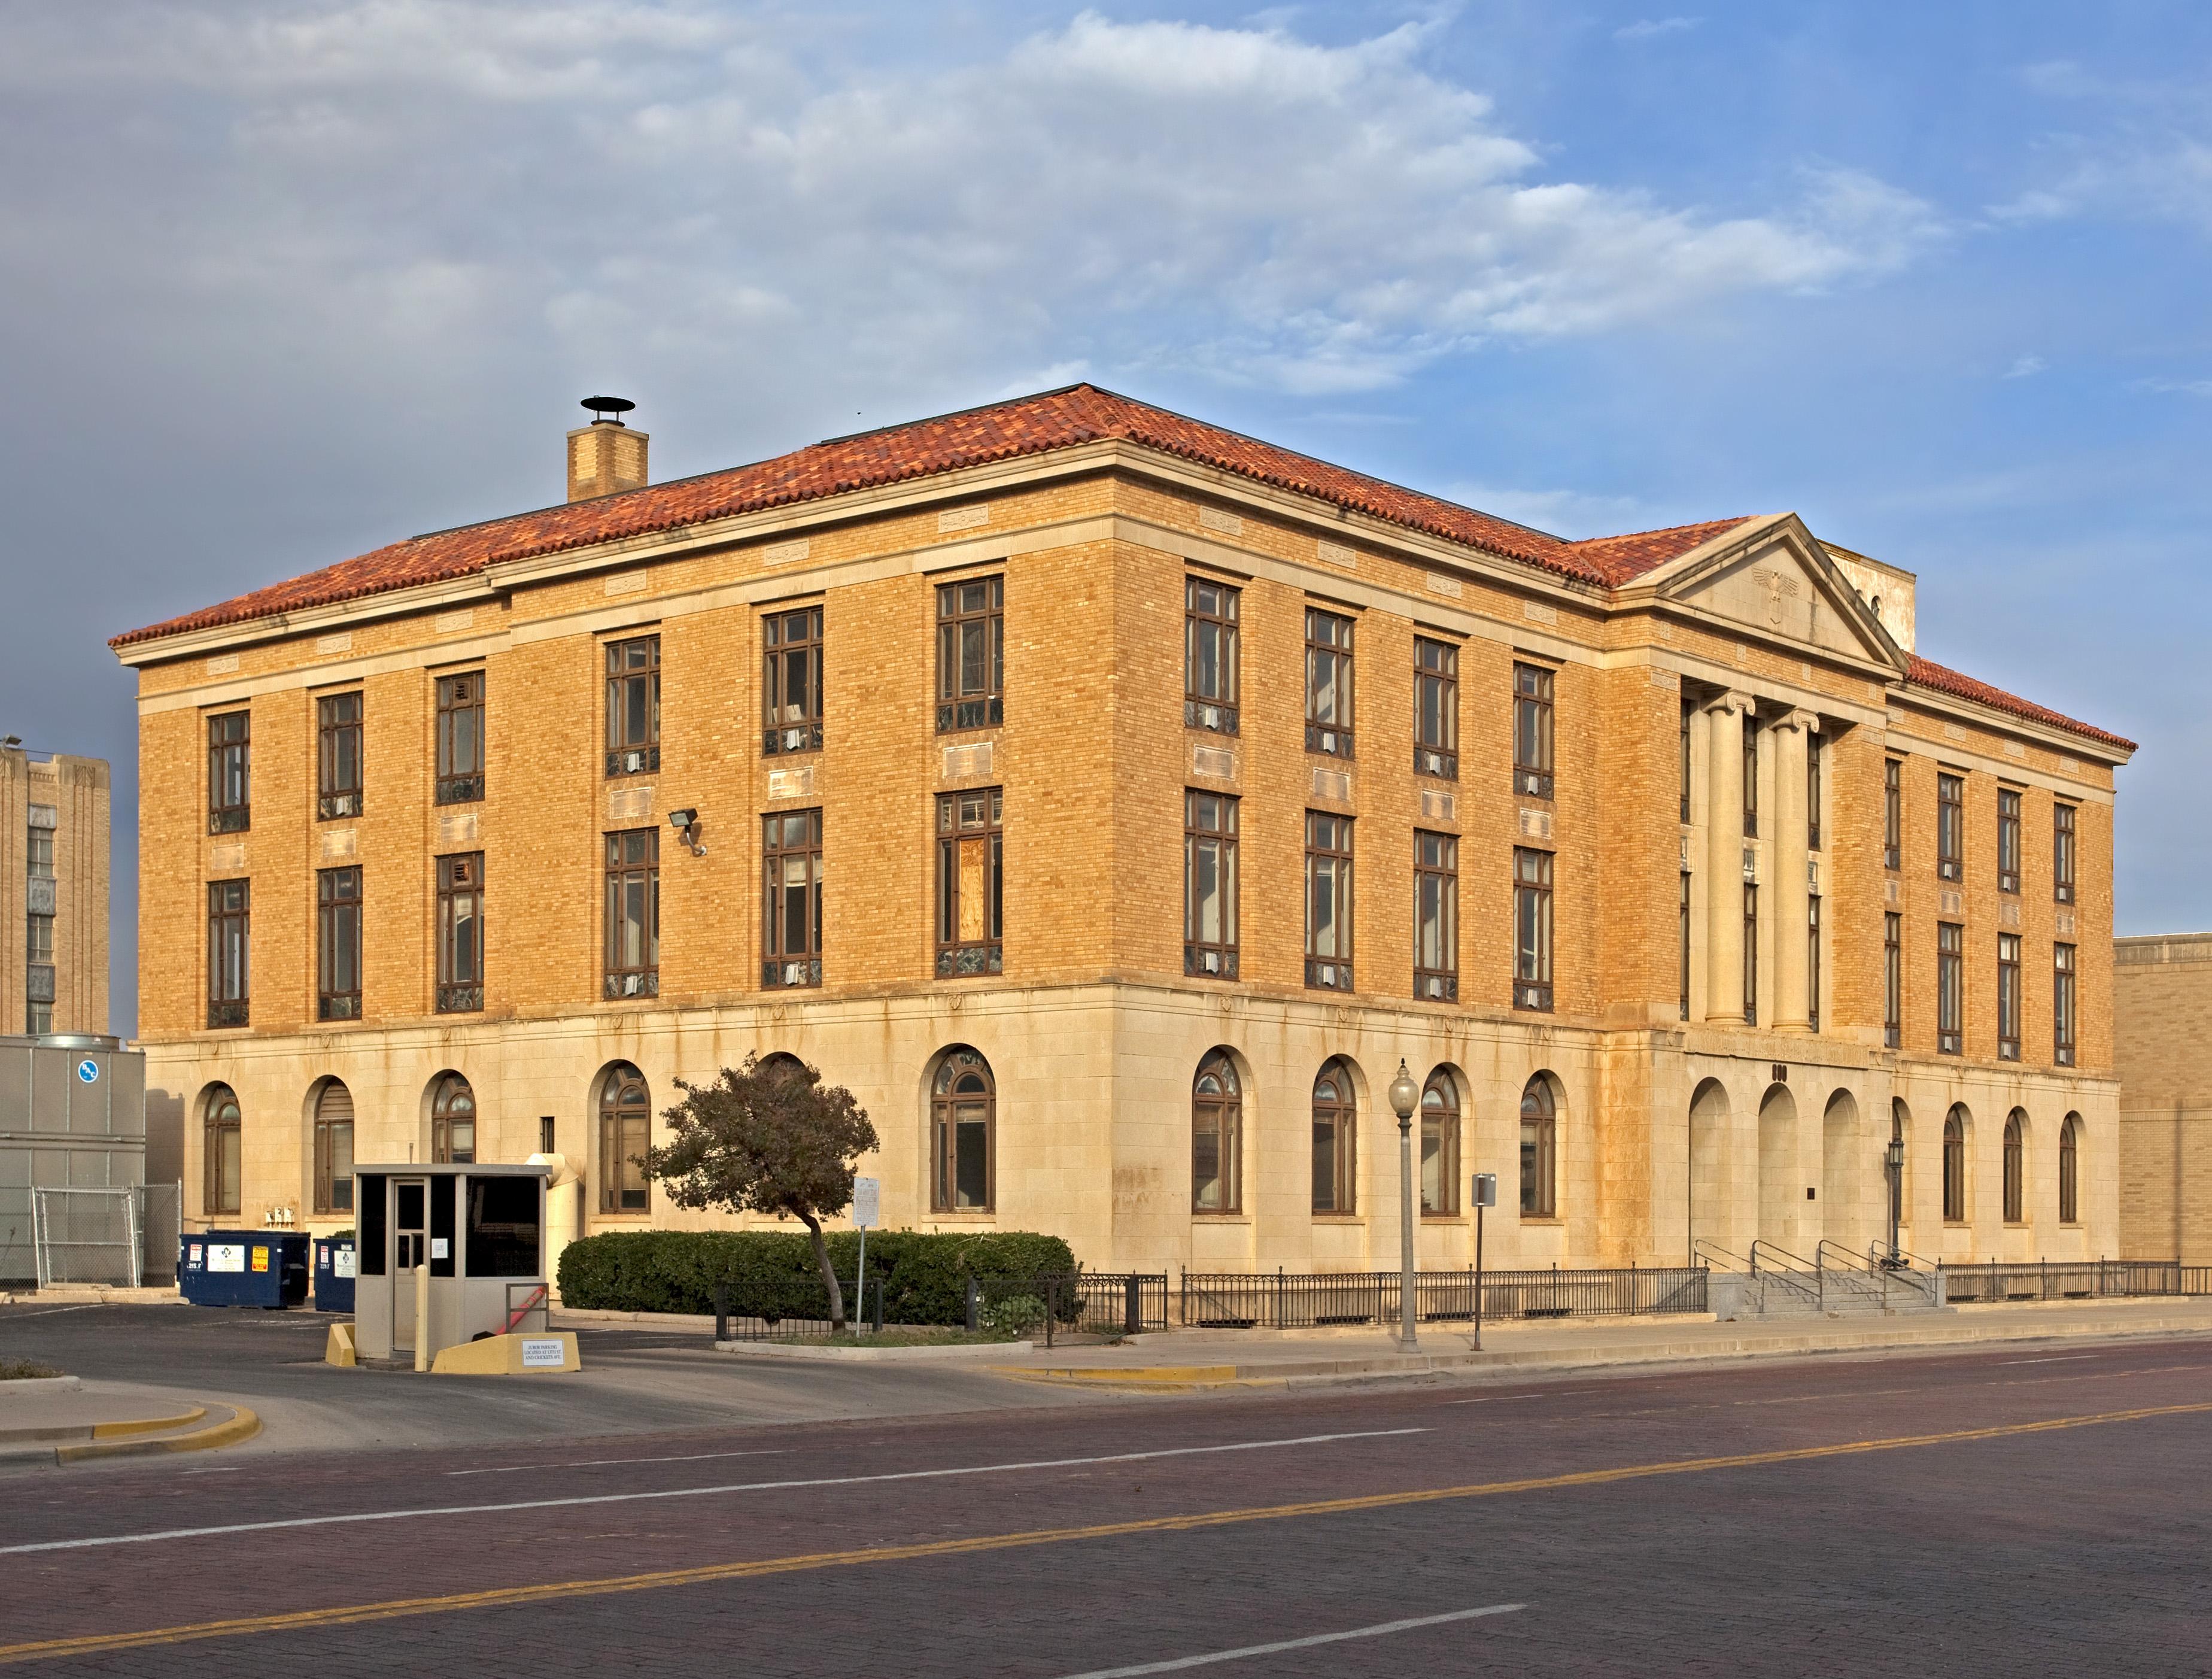 Lubbock Texas Familypedia FANDOM powered by Wikia